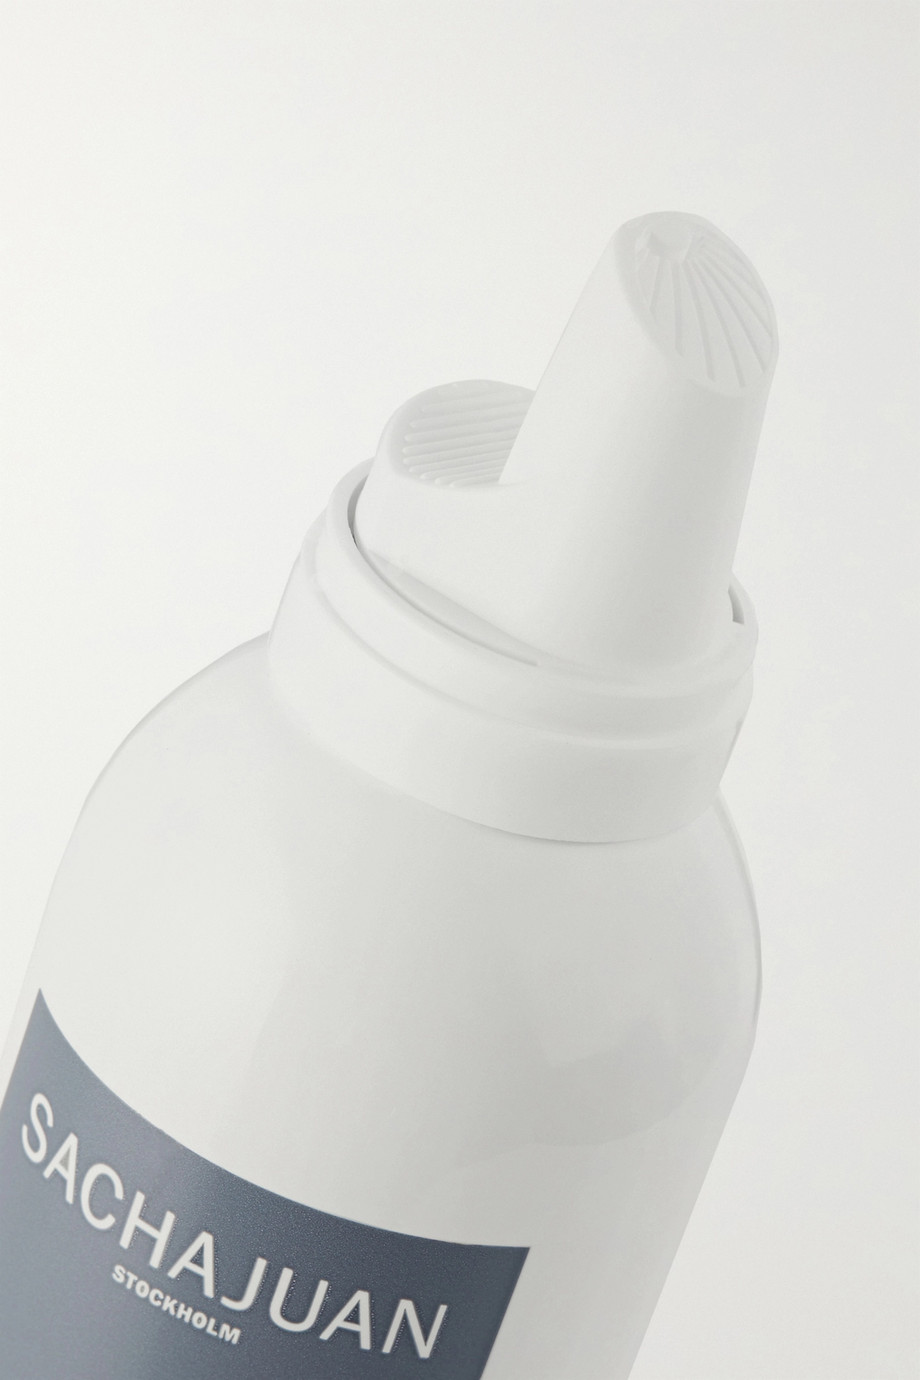 SACHAJUAN Dry Shampoo Mousse, 200ml